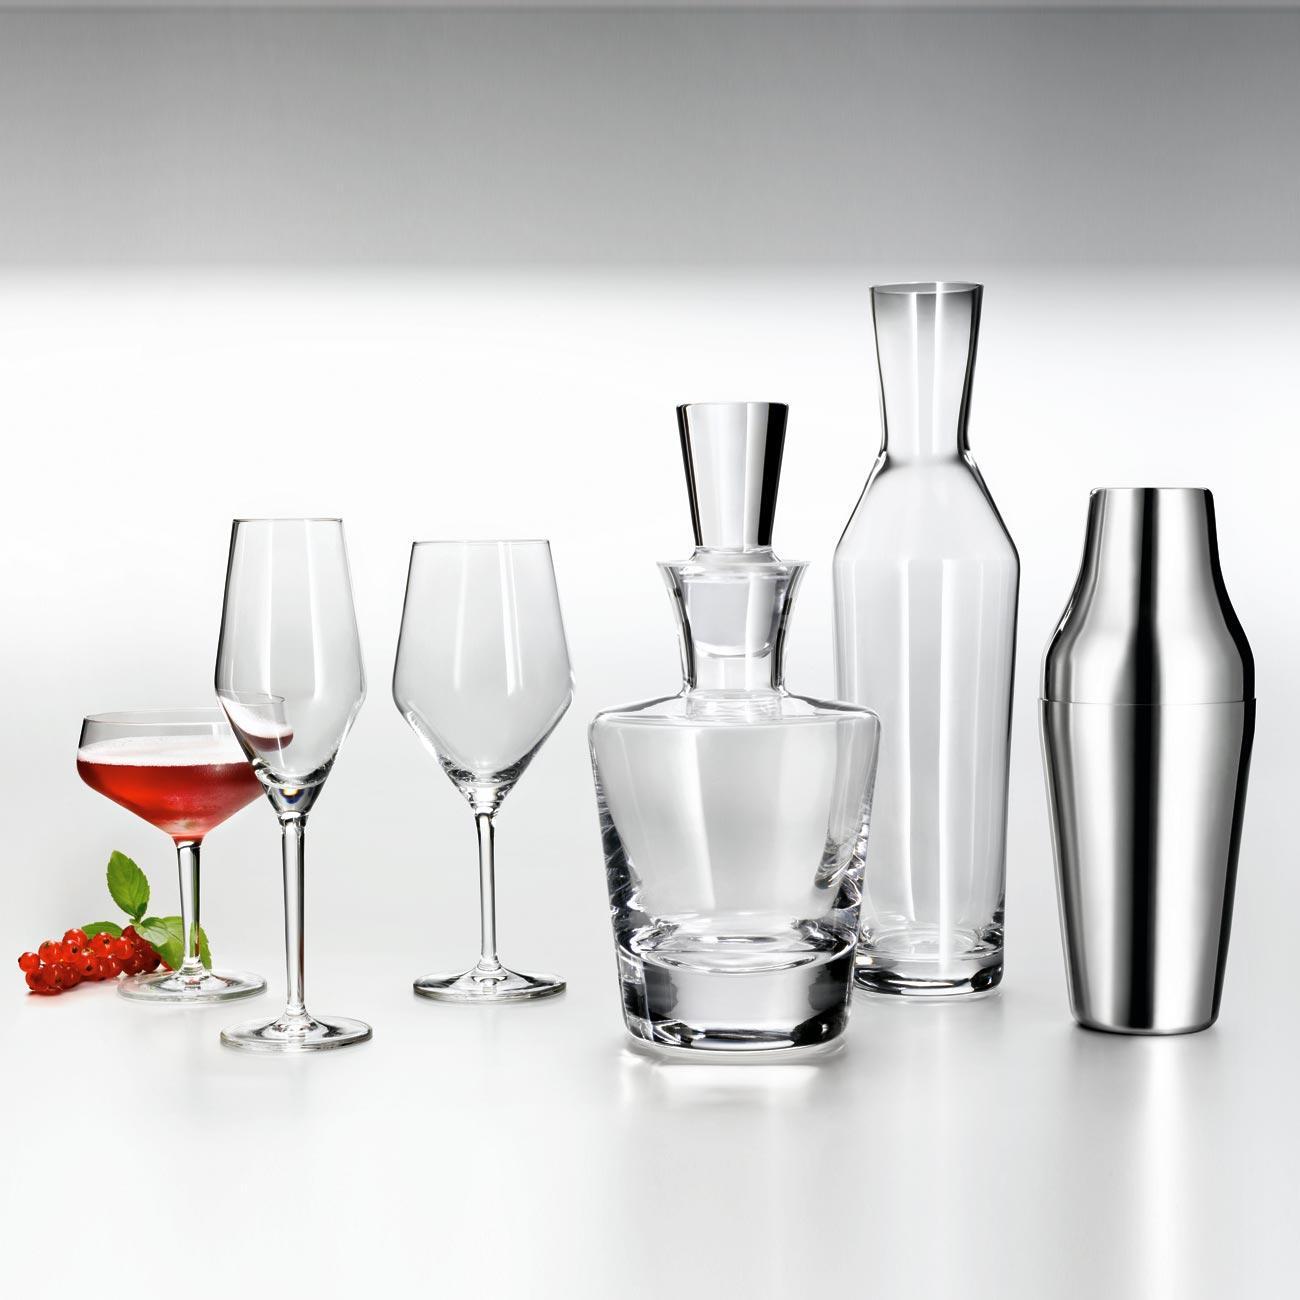 Bar-Serie Charles Schumann, Cocktail-Gläser, 6er Set